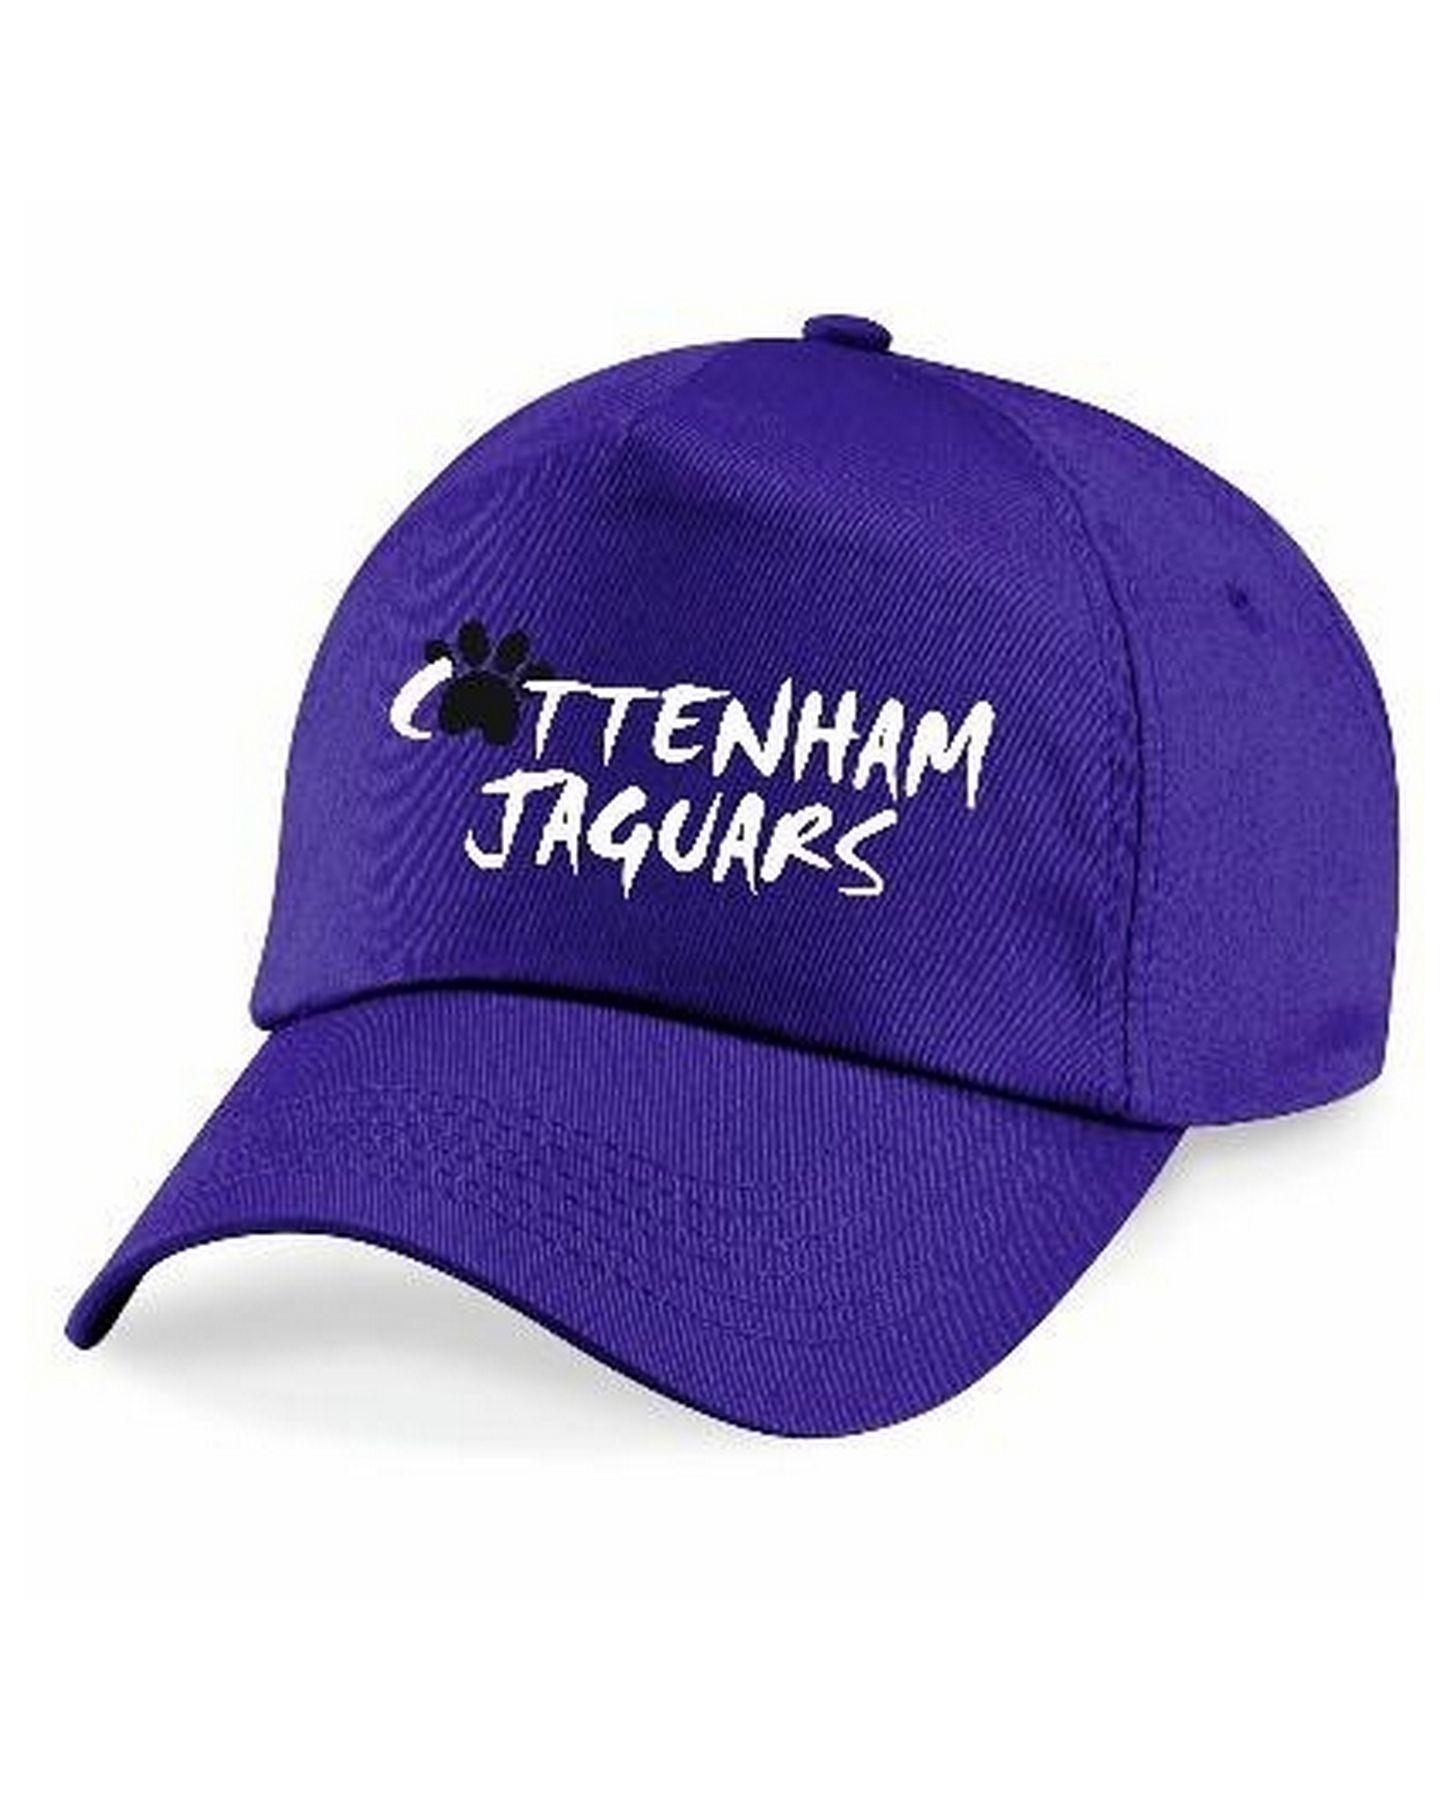 Cottenham Jaguars Netball Club Adult – Cap